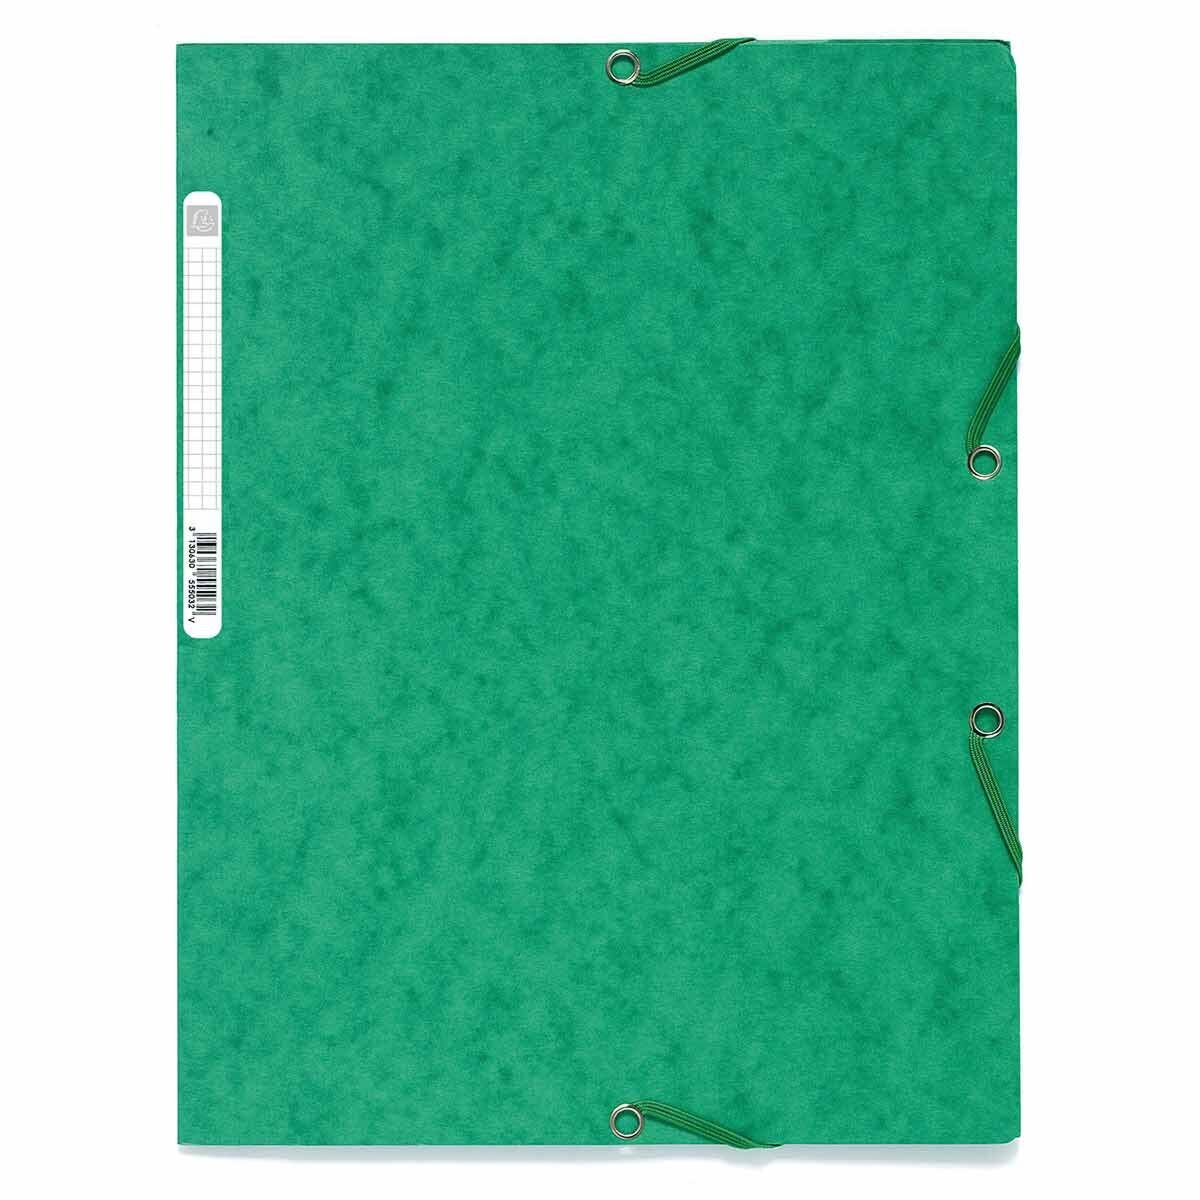 Exacompta Europa Elasticated 3 Flap Folder A4 400gsm Pack of 25